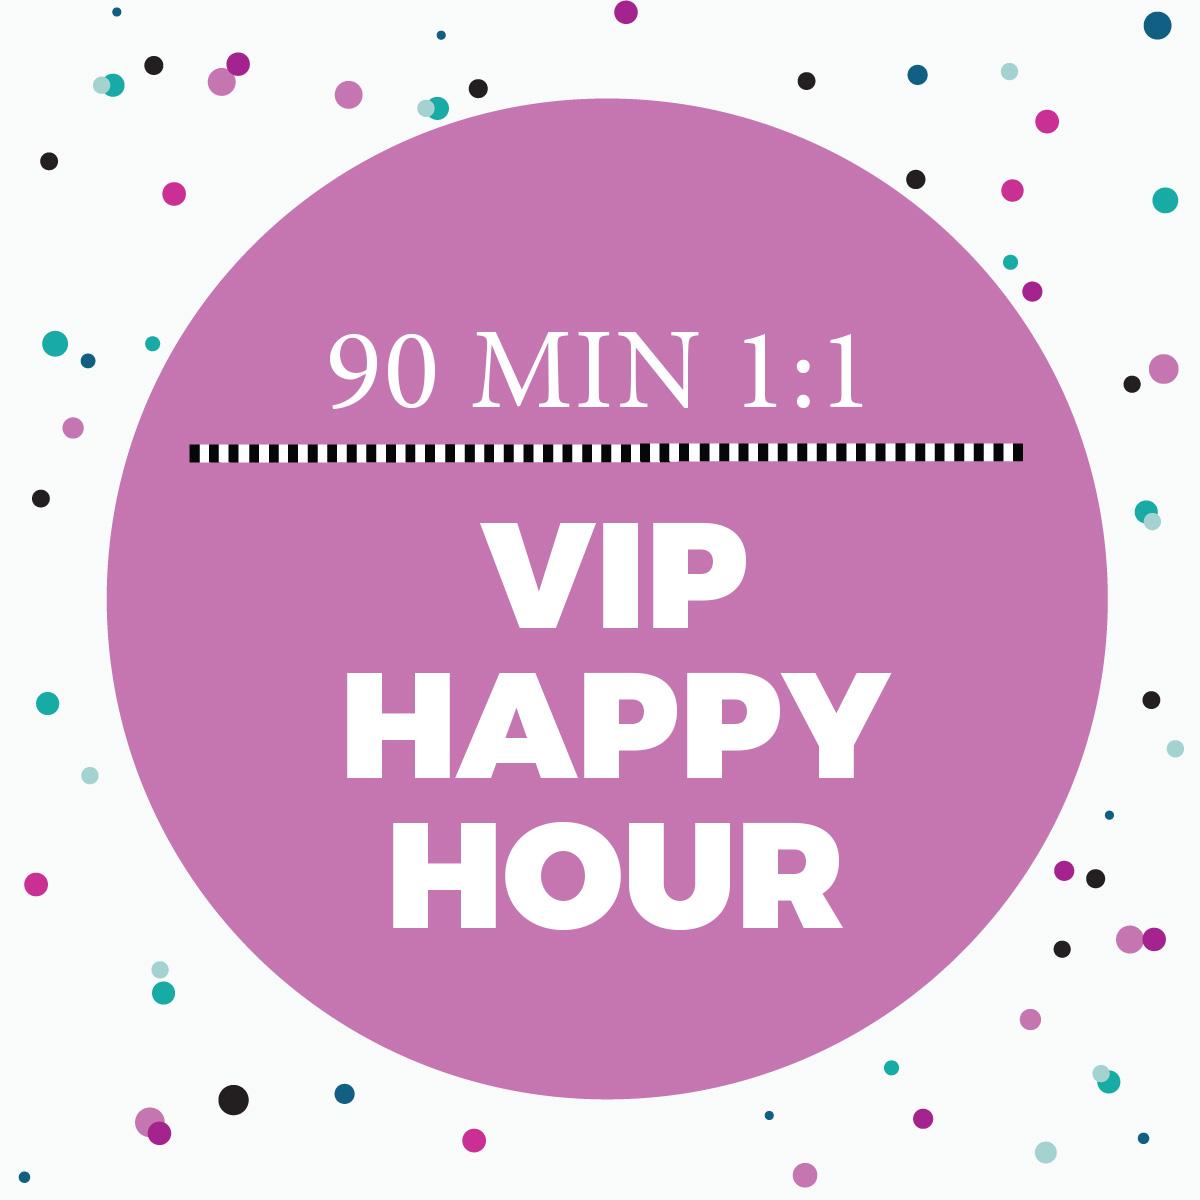 VIP HAPPY HOUR